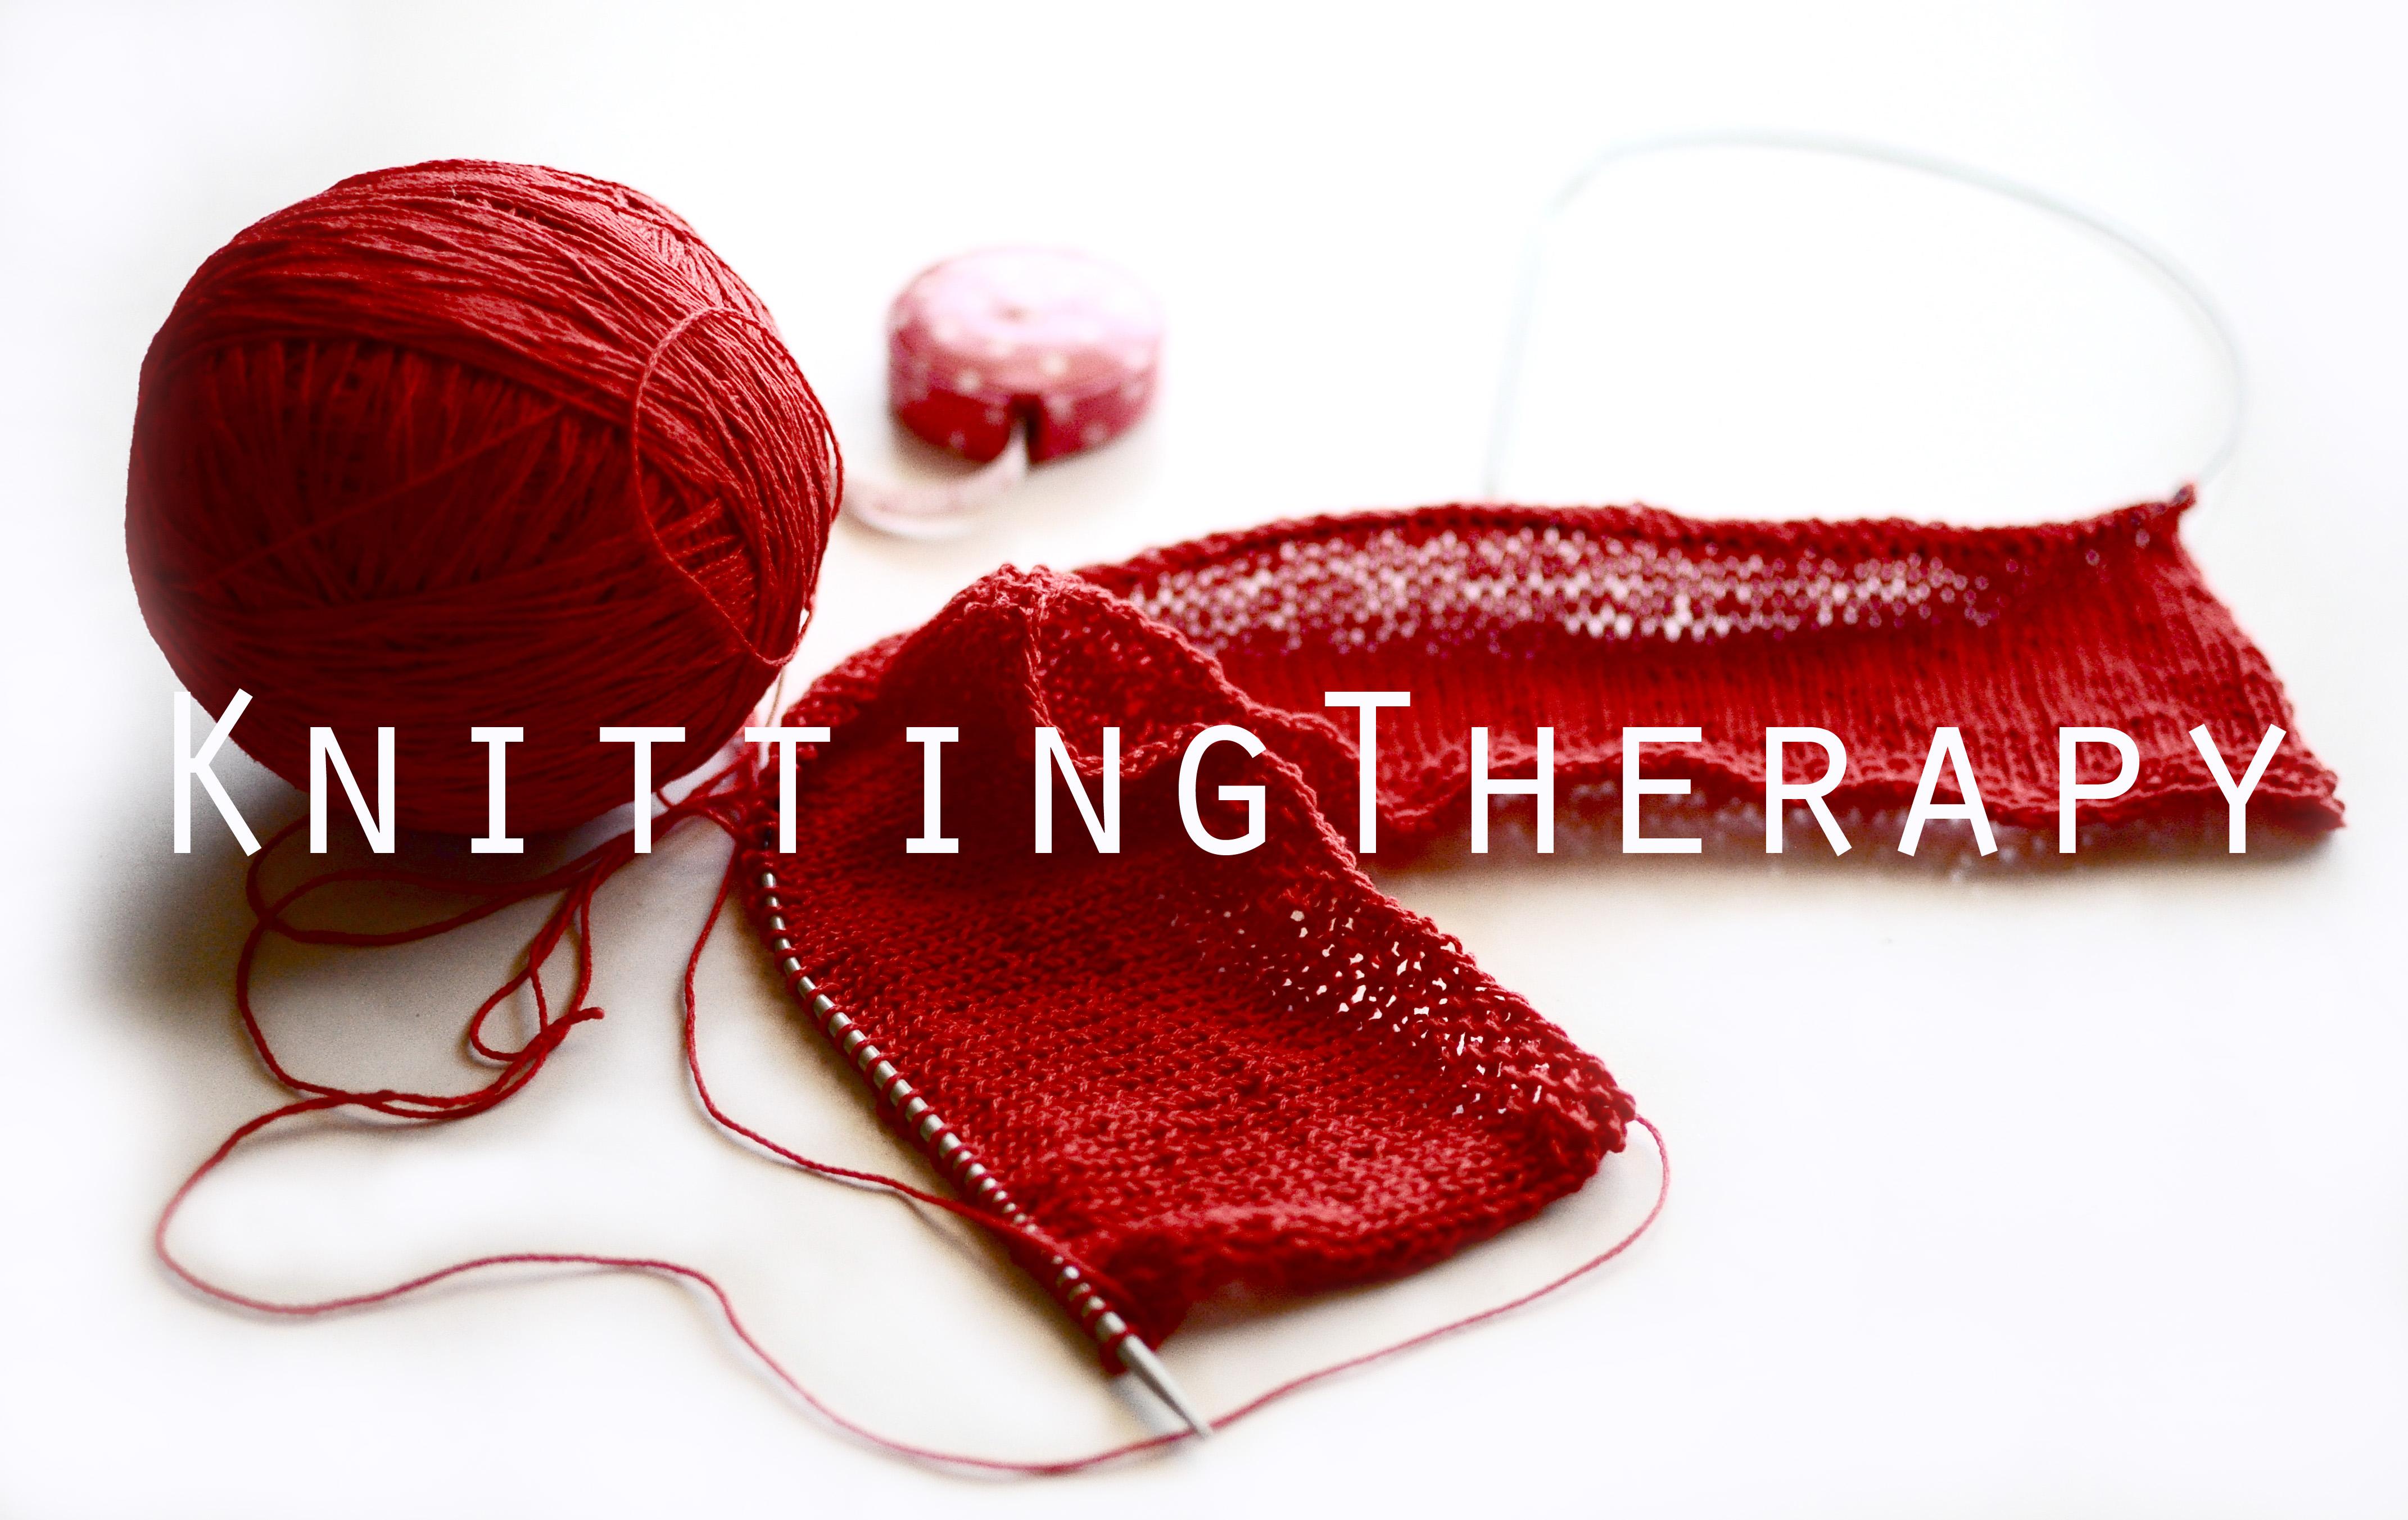 knittingtherapy